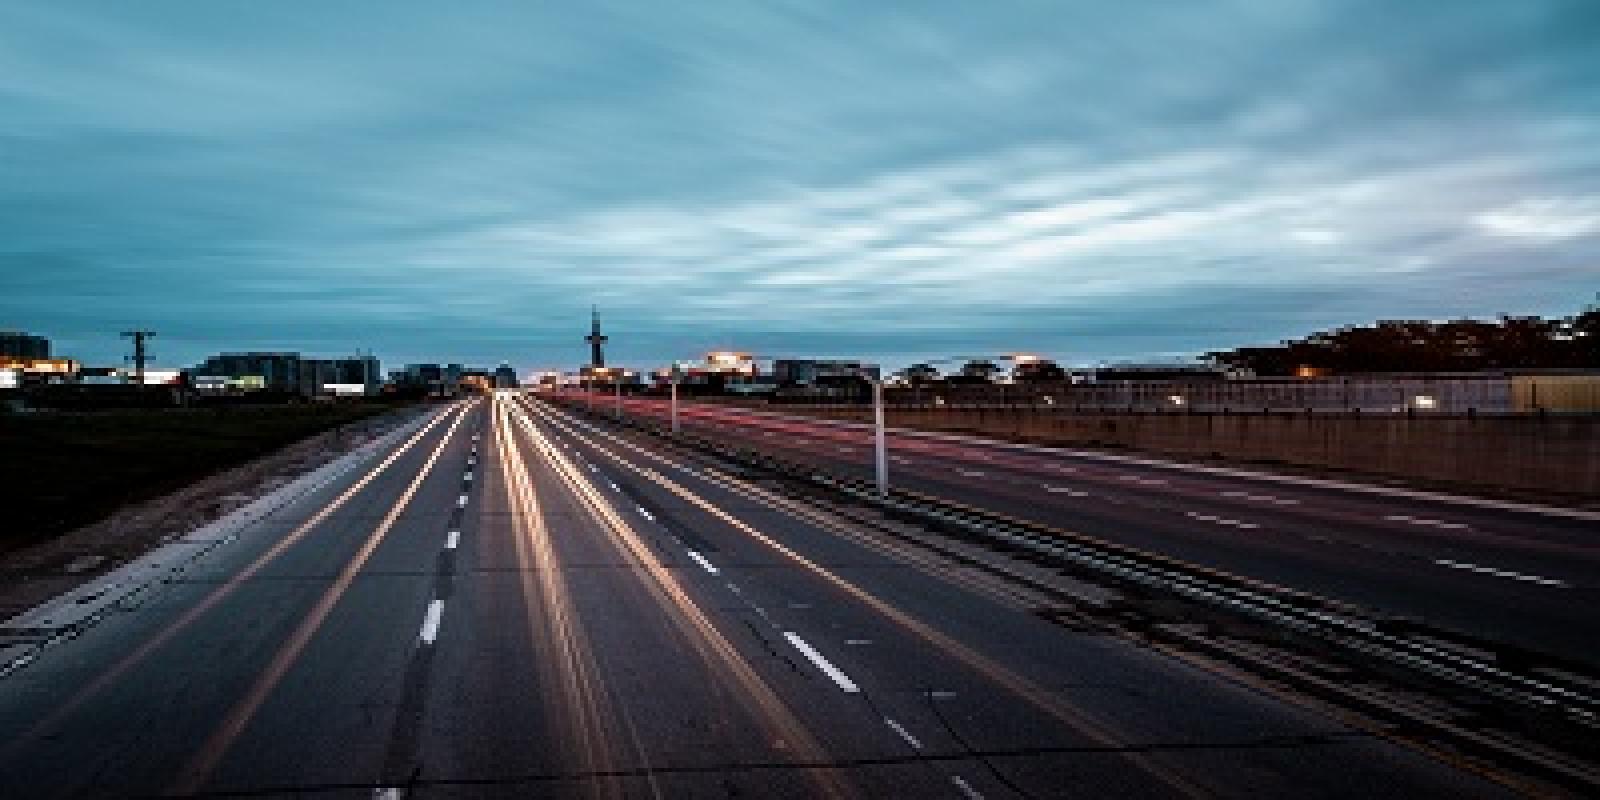 19,000 drivers break down in live motorway lanes over two years